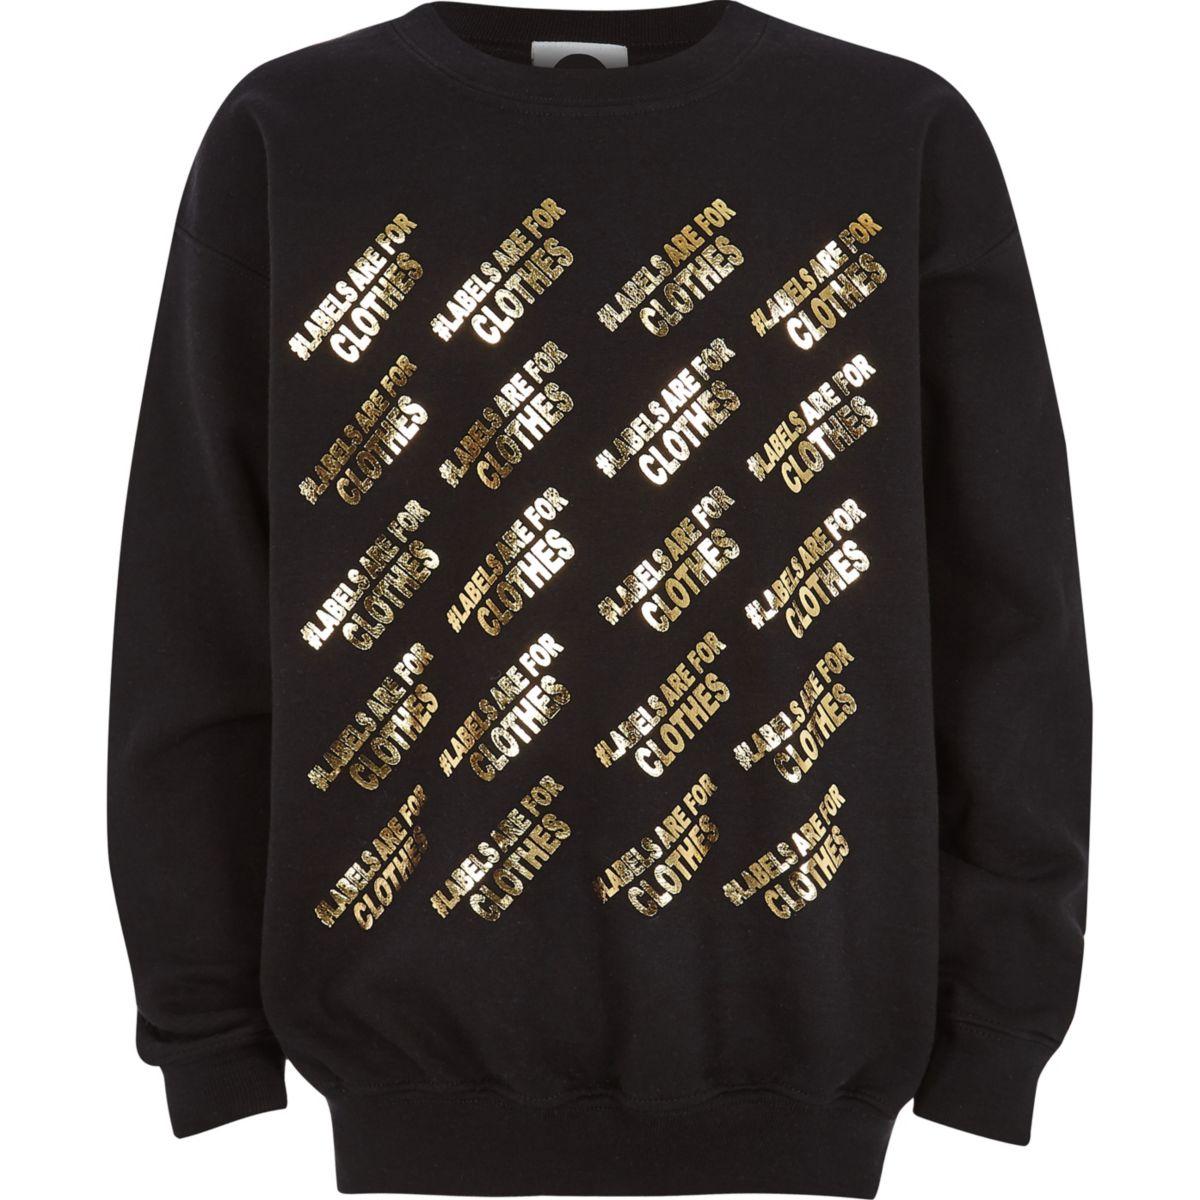 Kids black Ditch the Label charity sweatshirt